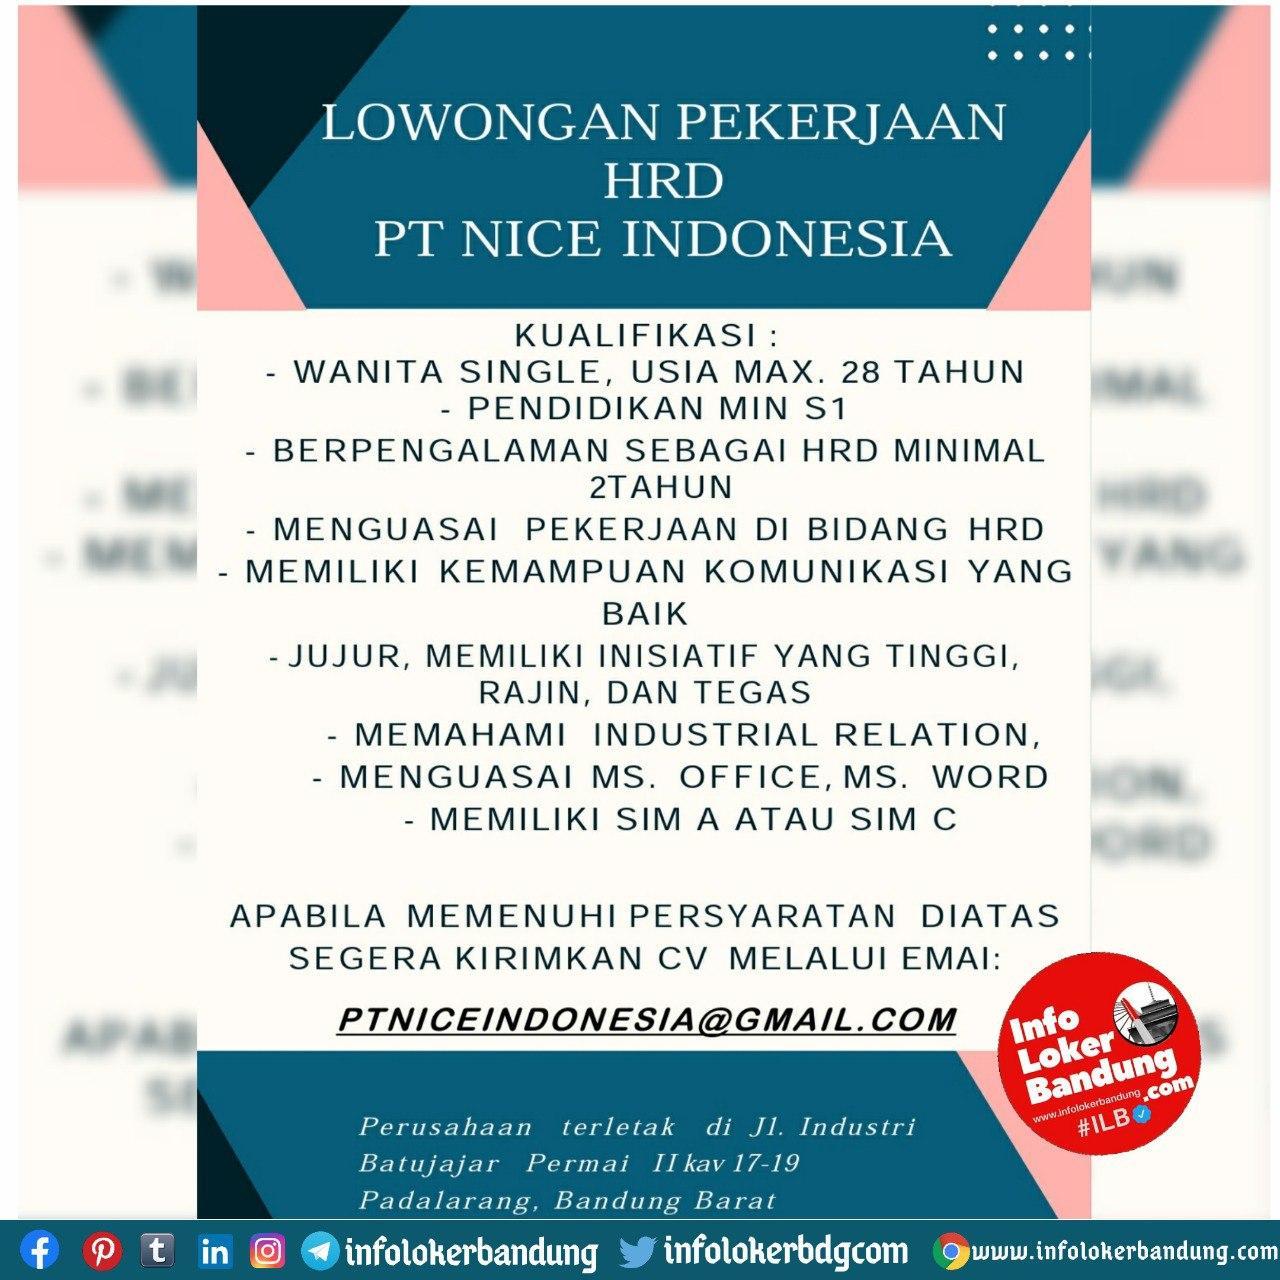 Lowongan Kerja PT. Nice Indonesia Bandung Oktober 2020